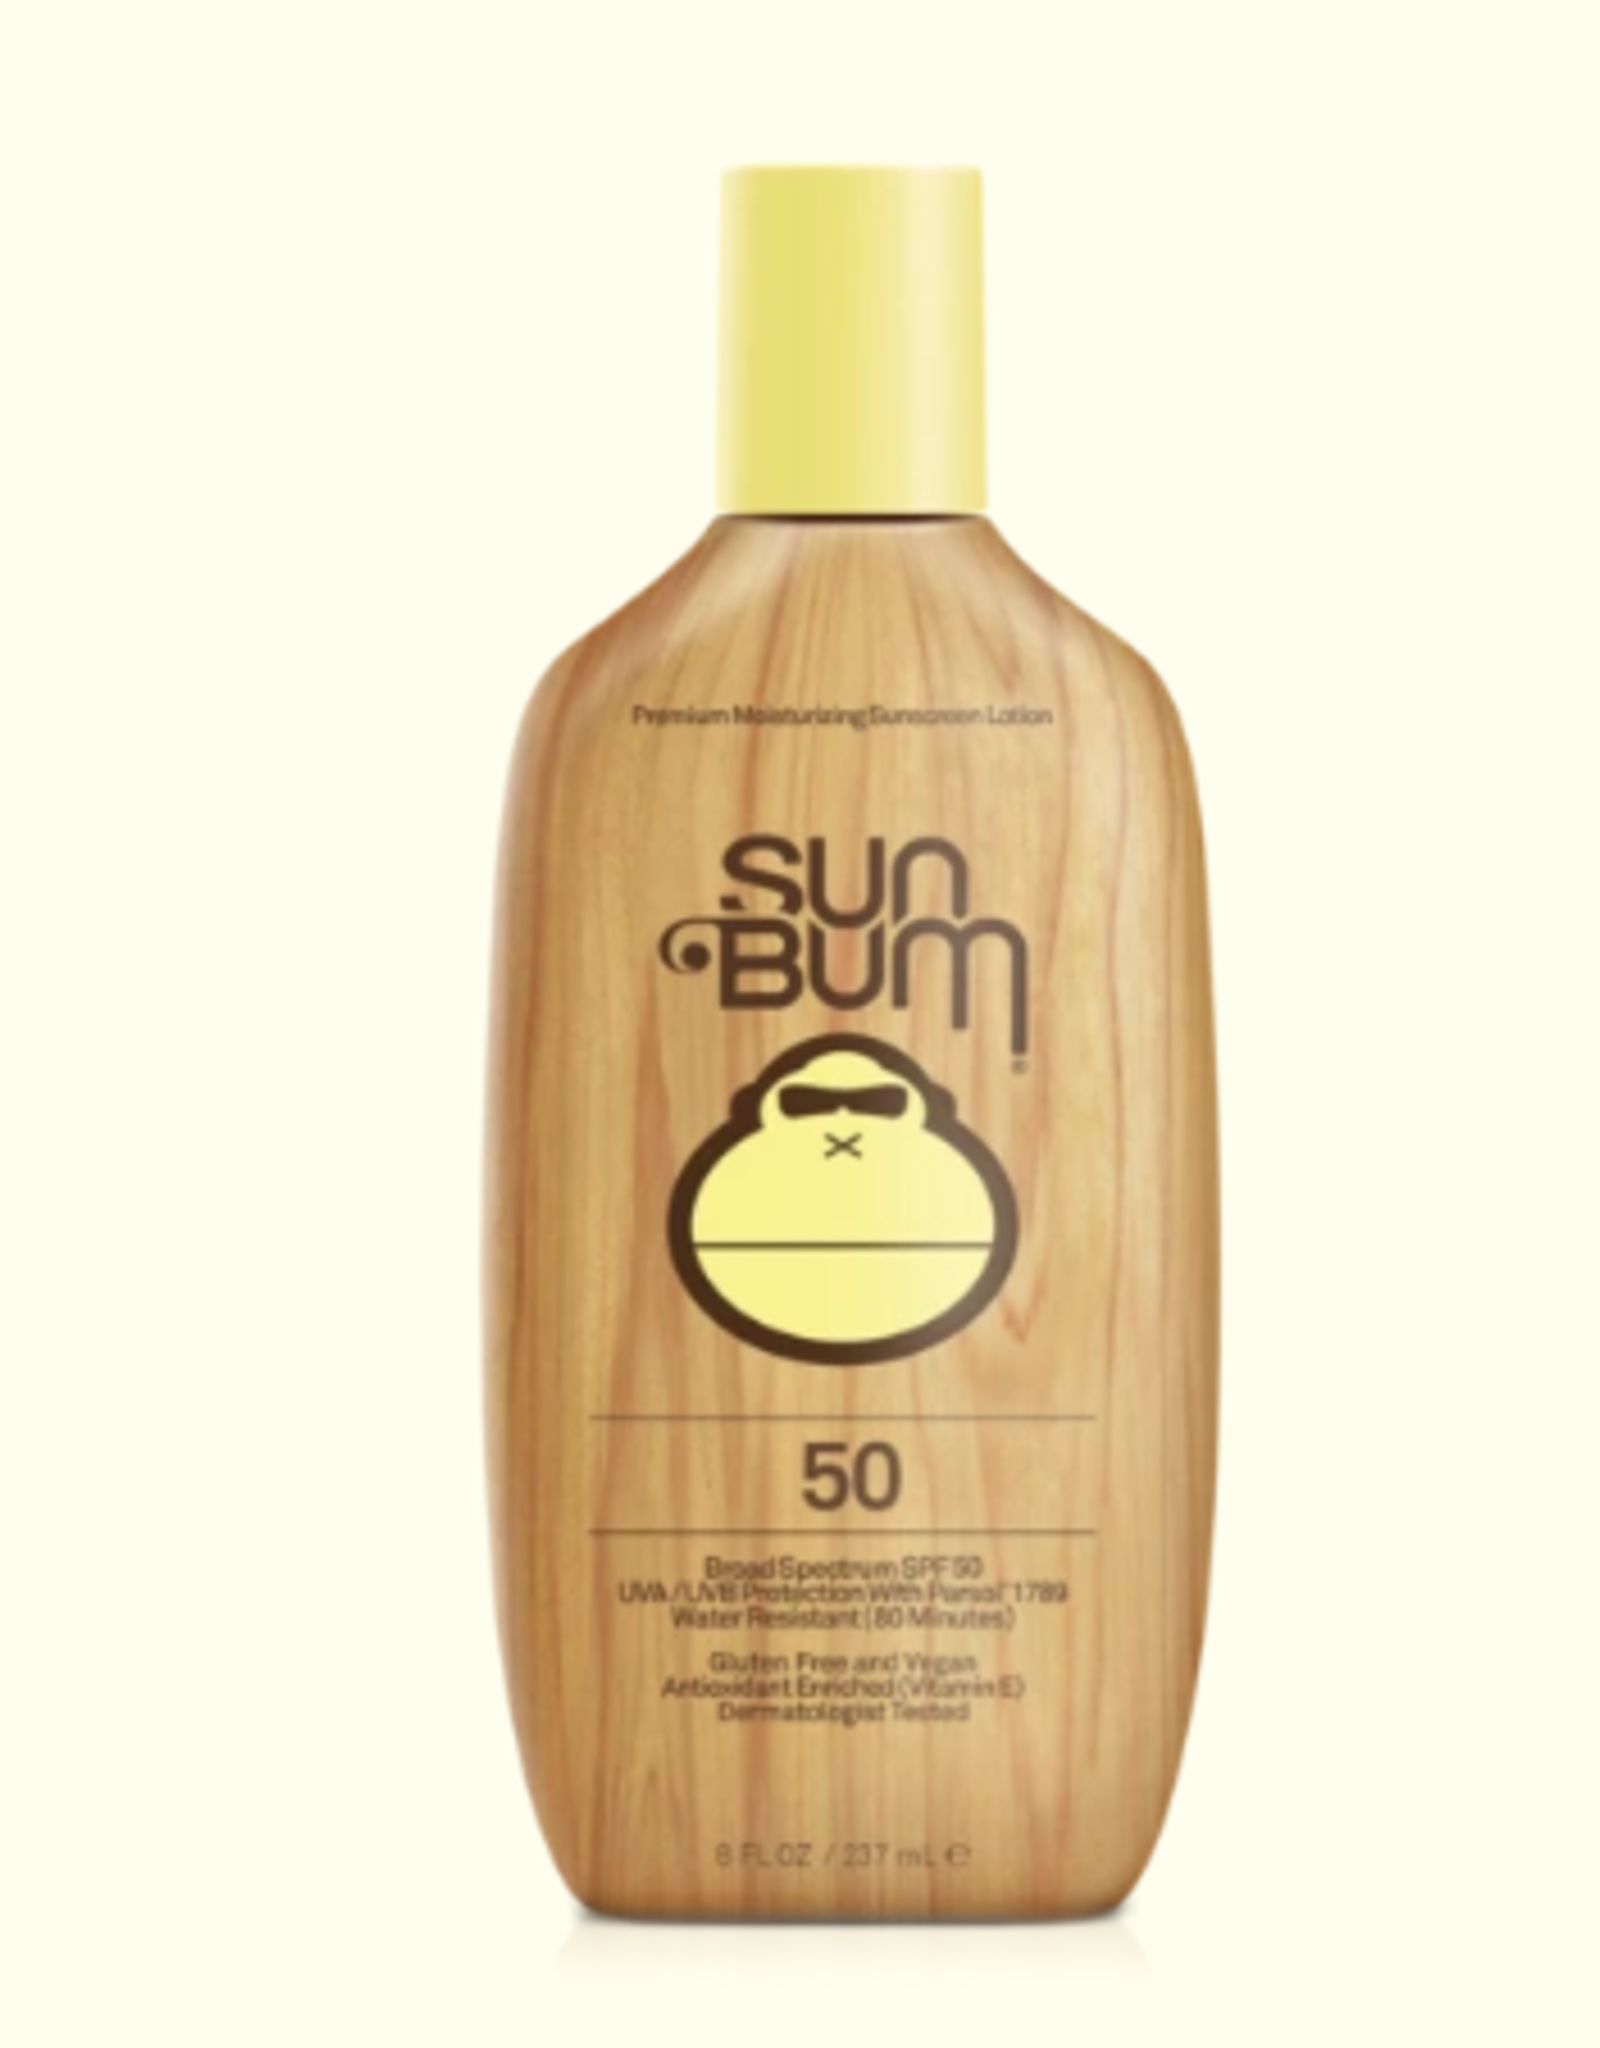 Sun Bum Sun Bum SPF 50 - Lotion 8 oz.